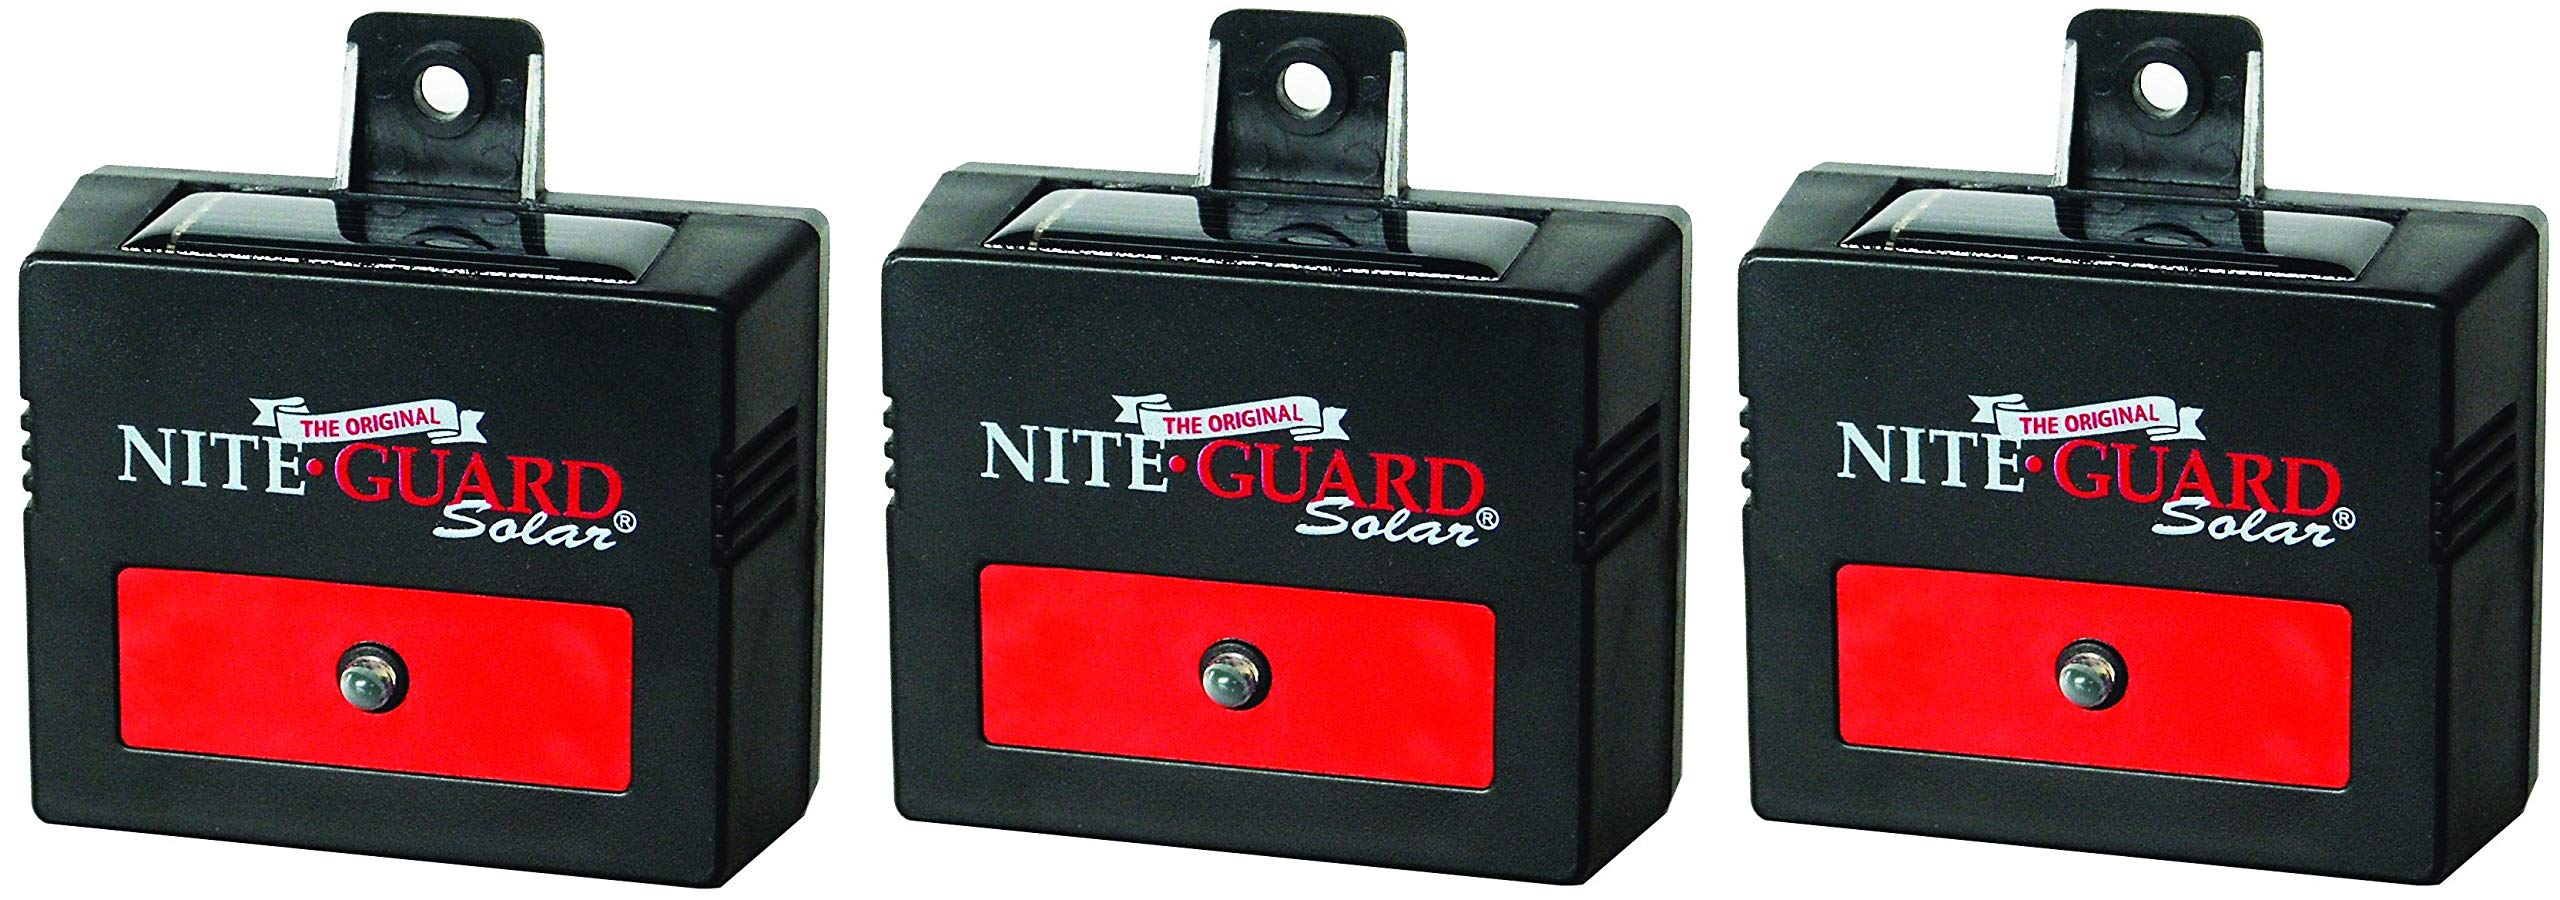 Nite Guard Solar NG-001 Predator Control Light, Single Pack (3-(Pack))